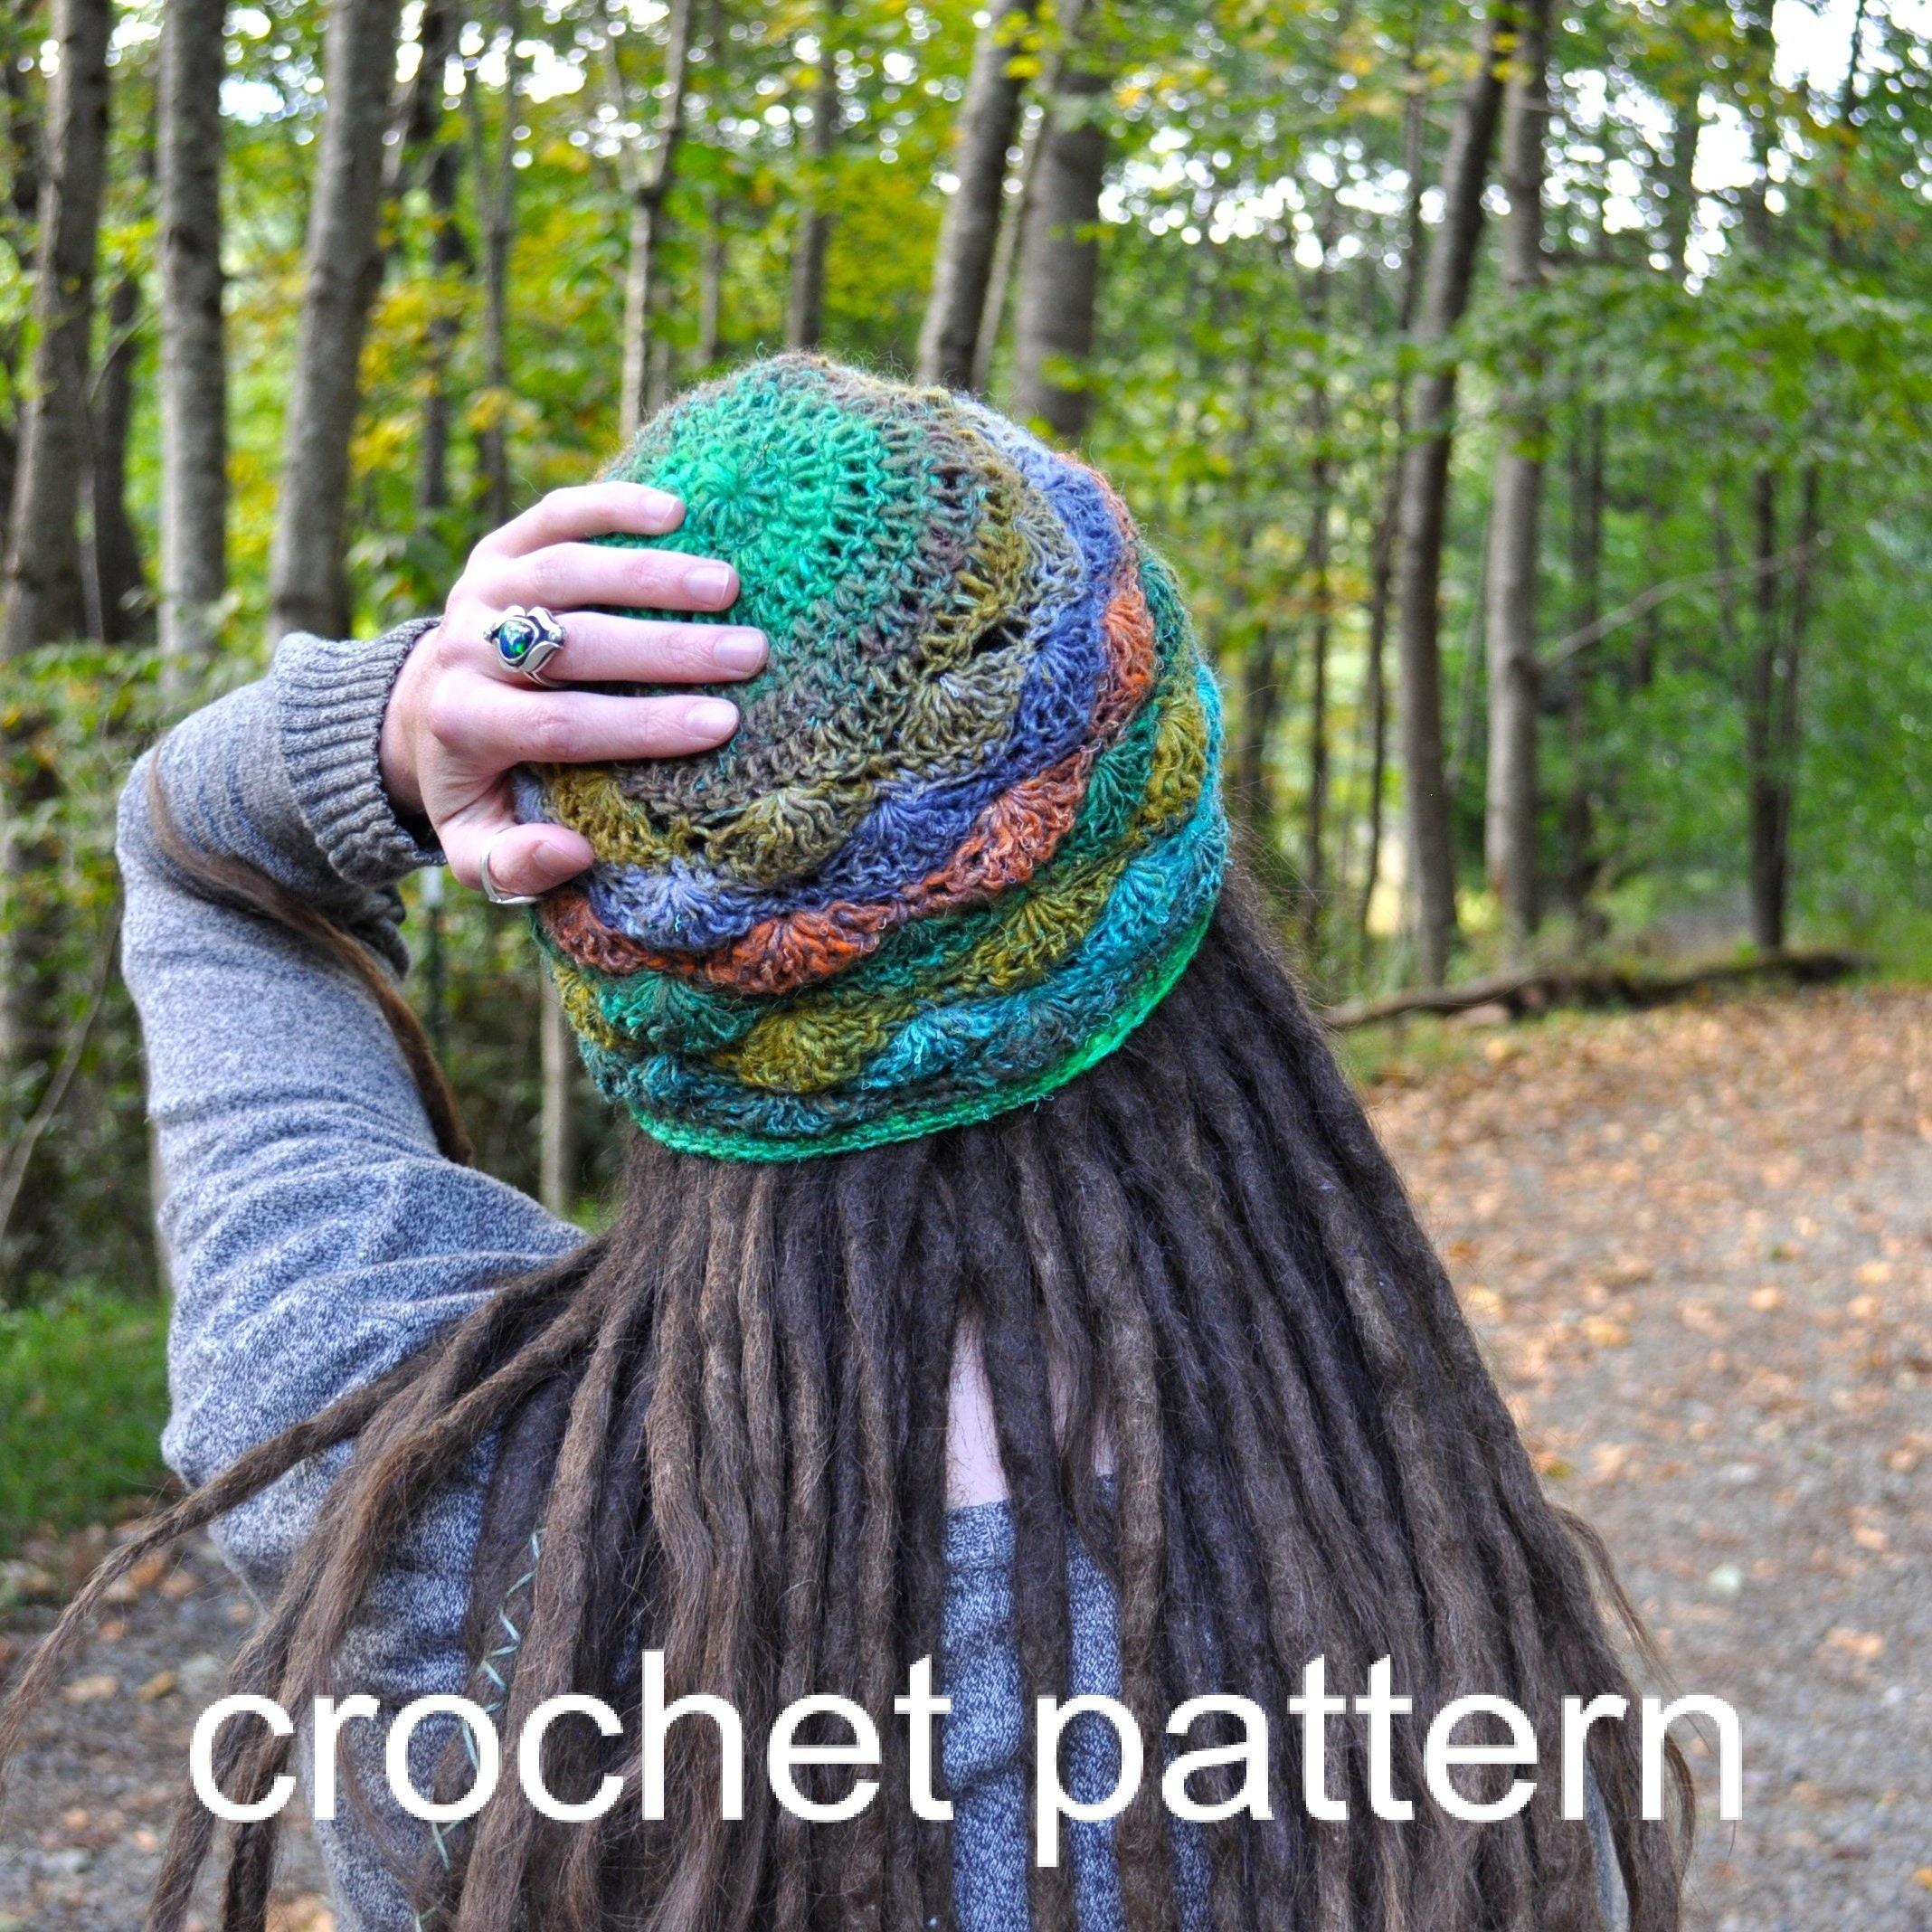 Crochet Pattern Quick Easy Lacy Shell Hat For Women Cobblestone